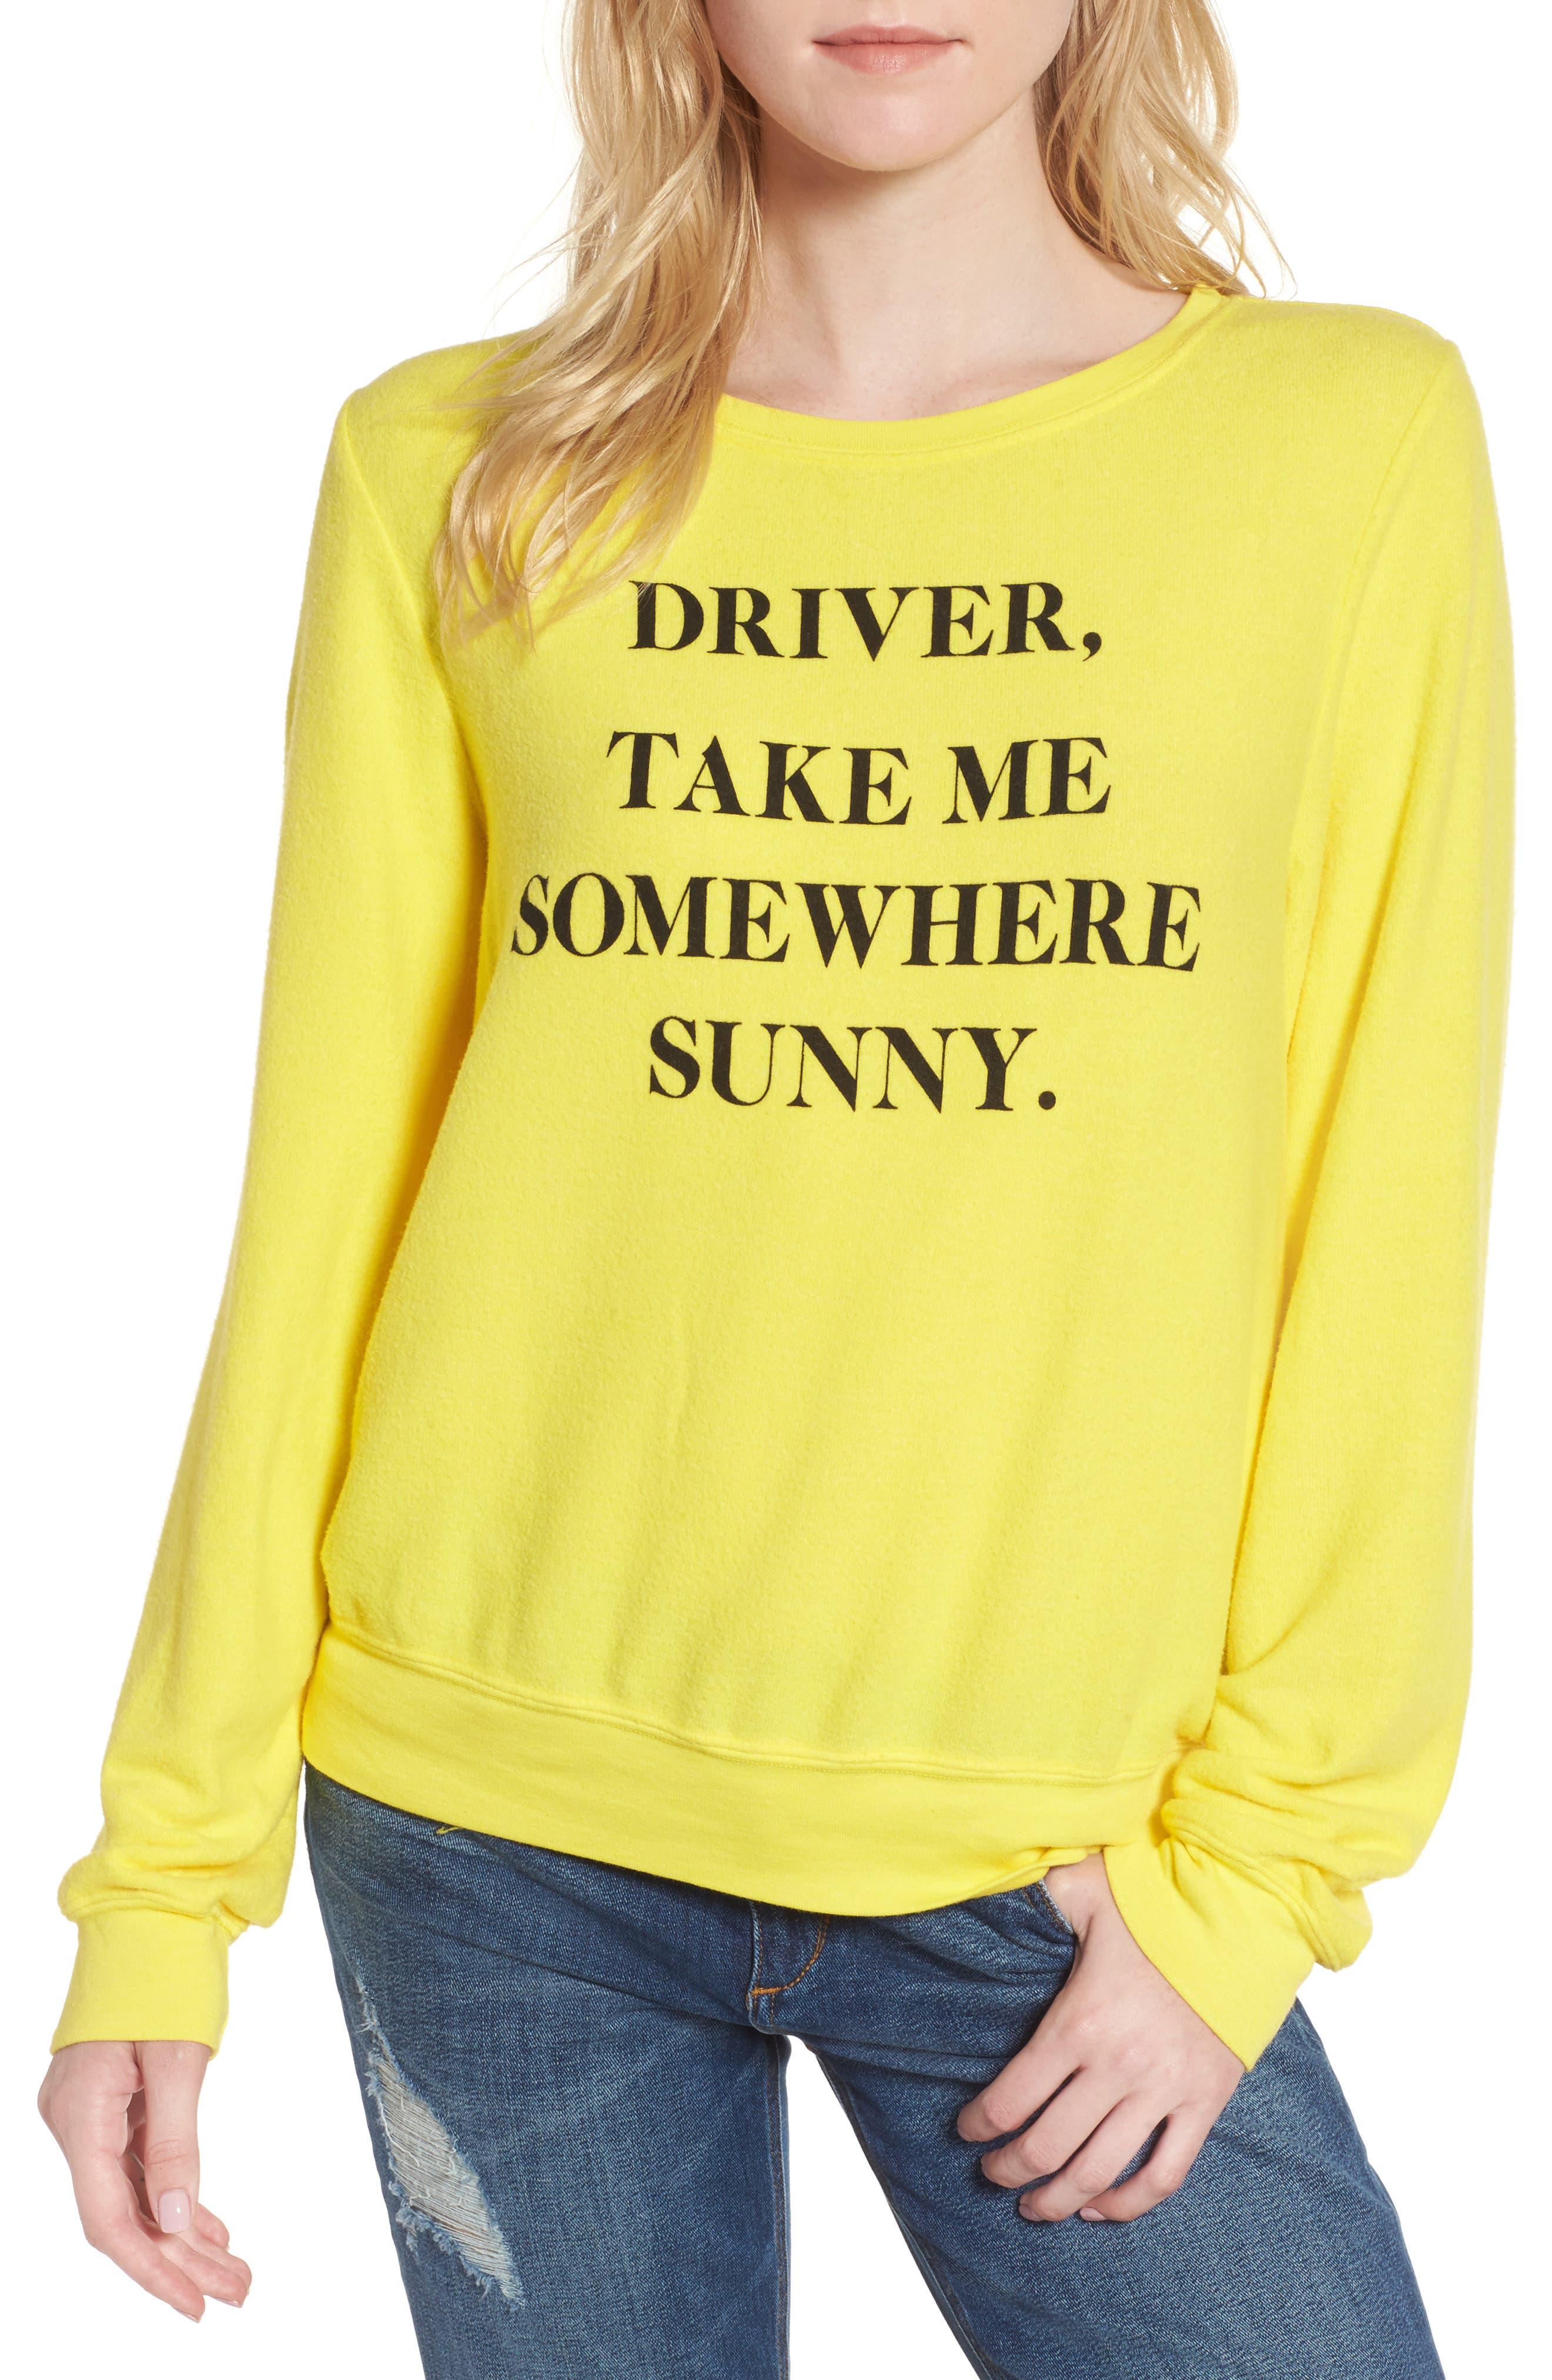 'Somewhere Sunny' Sweatshirt,                             Main thumbnail 1, color,                             730